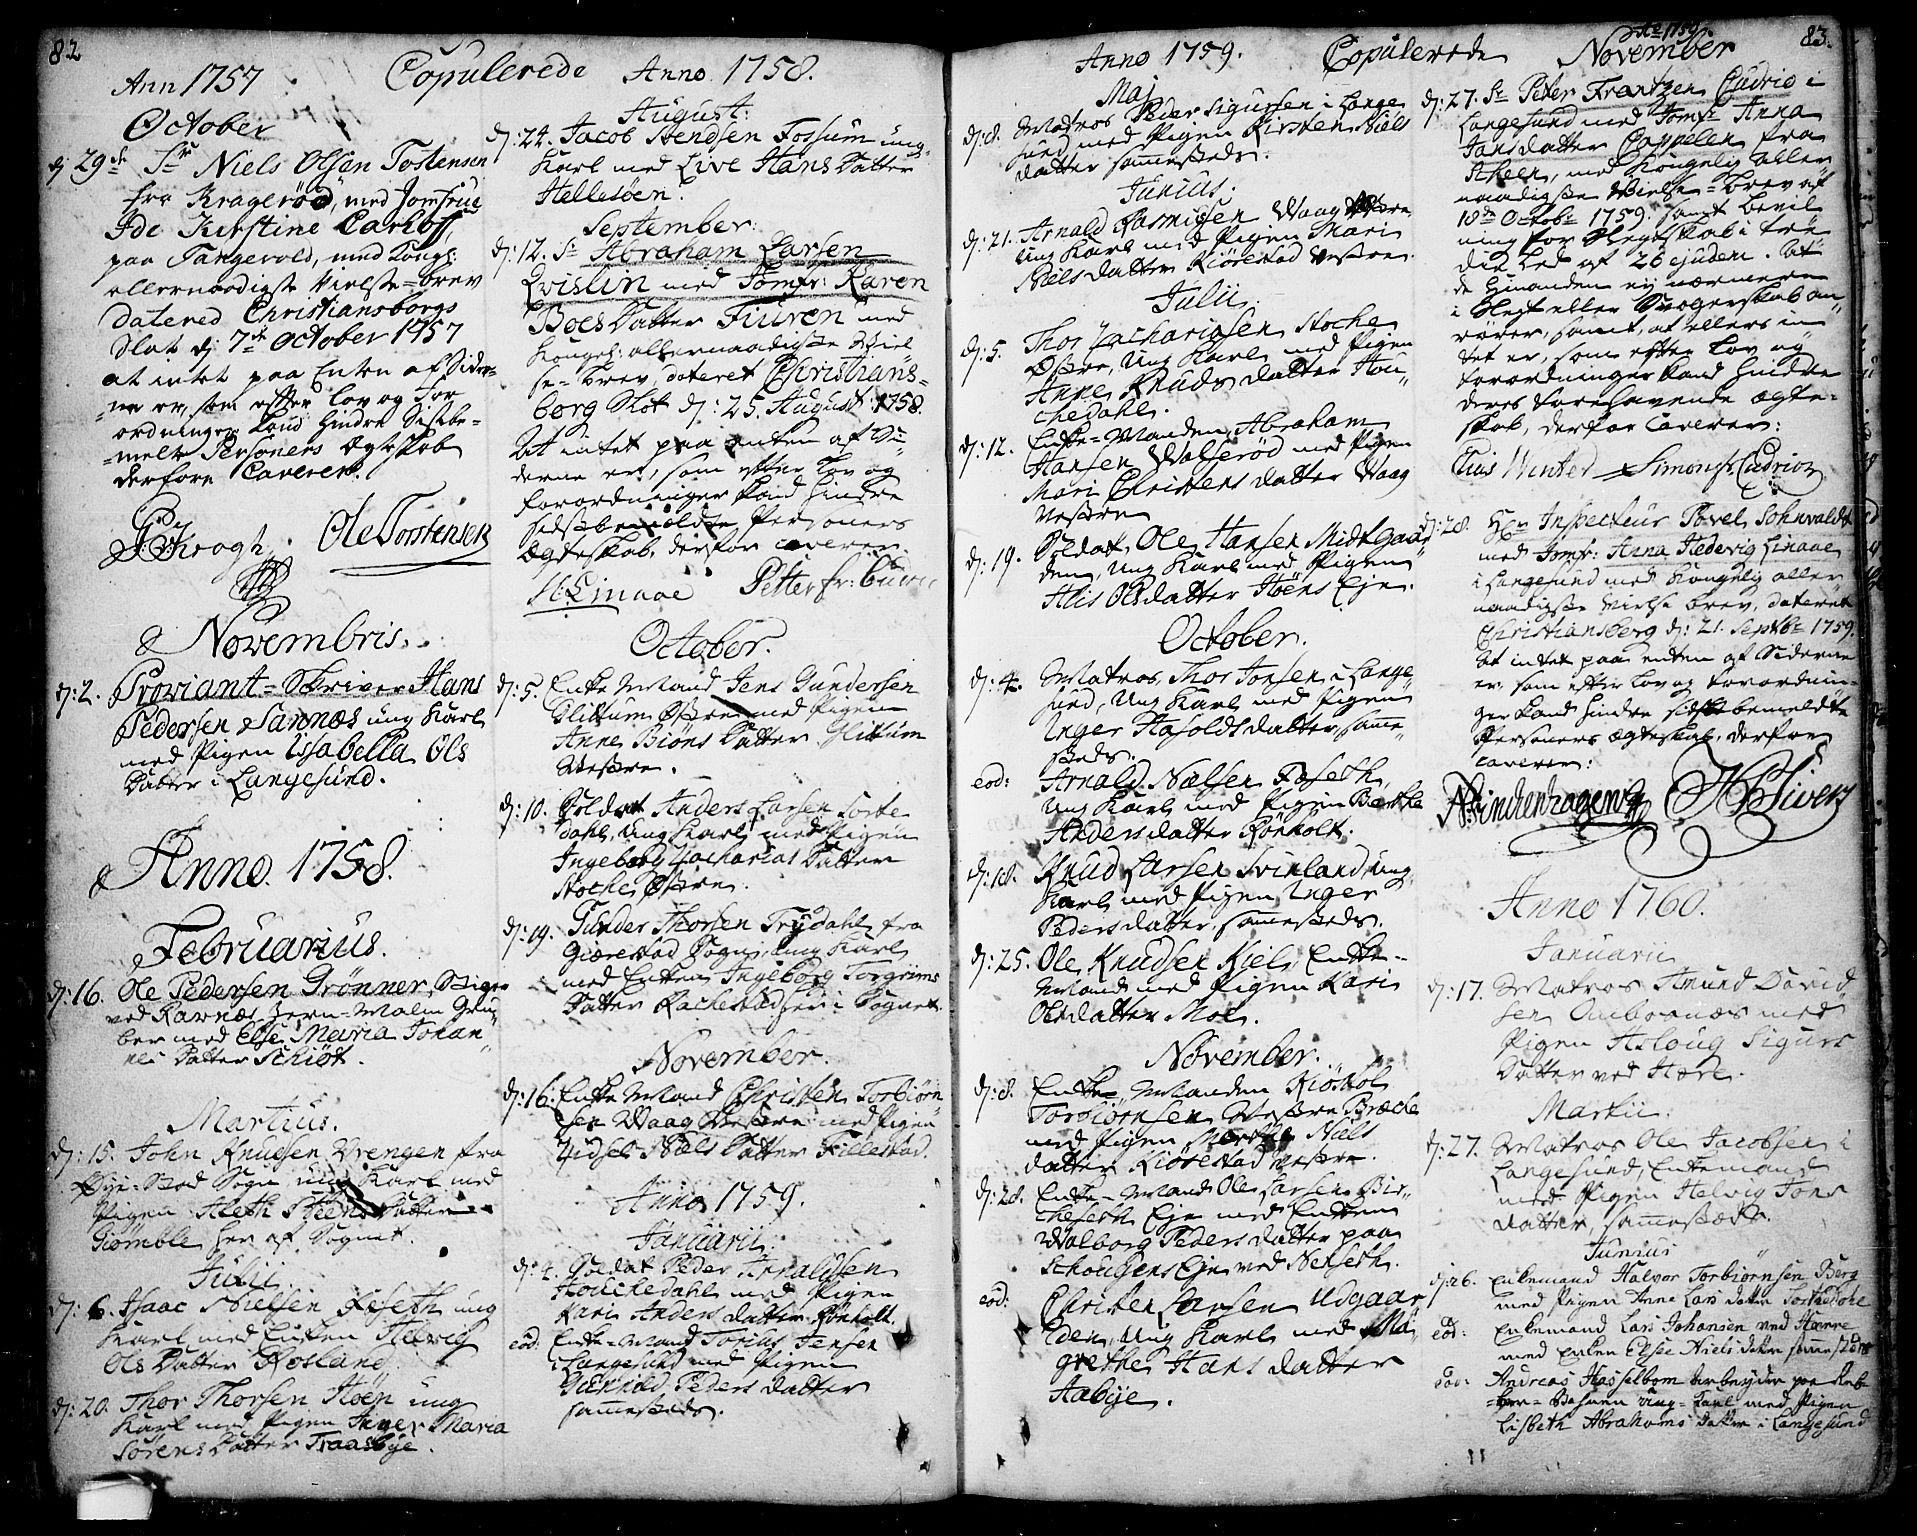 SAKO, Bamble kirkebøker, F/Fa/L0001: Ministerialbok nr. I 1, 1702-1774, s. 82-83